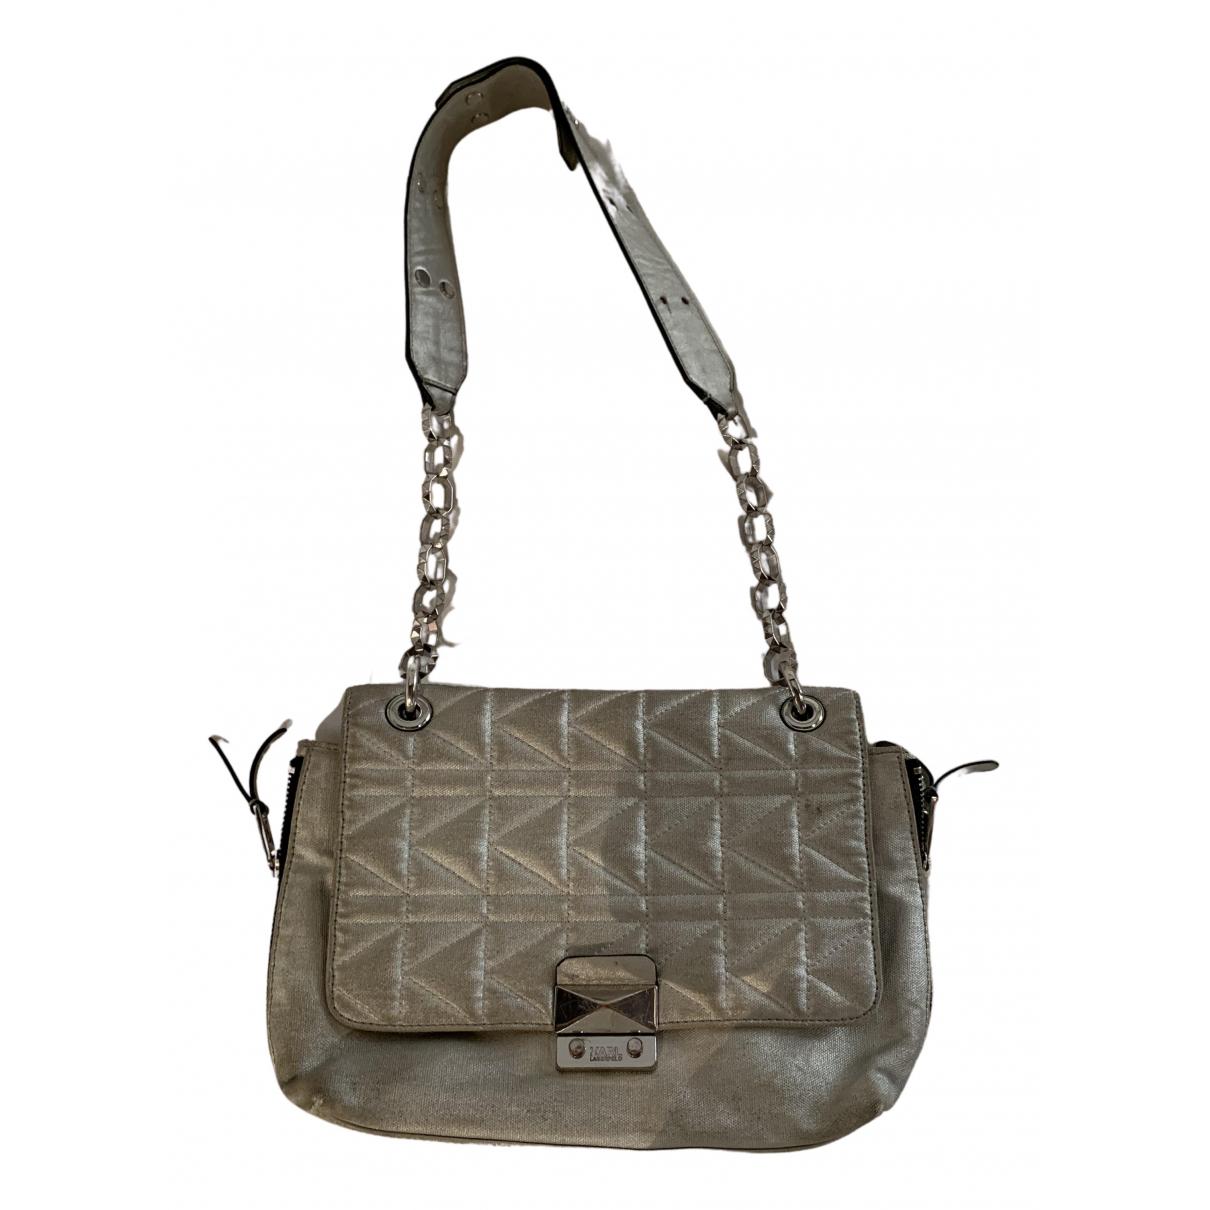 Karl Lagerfeld N Silver handbag for Women N